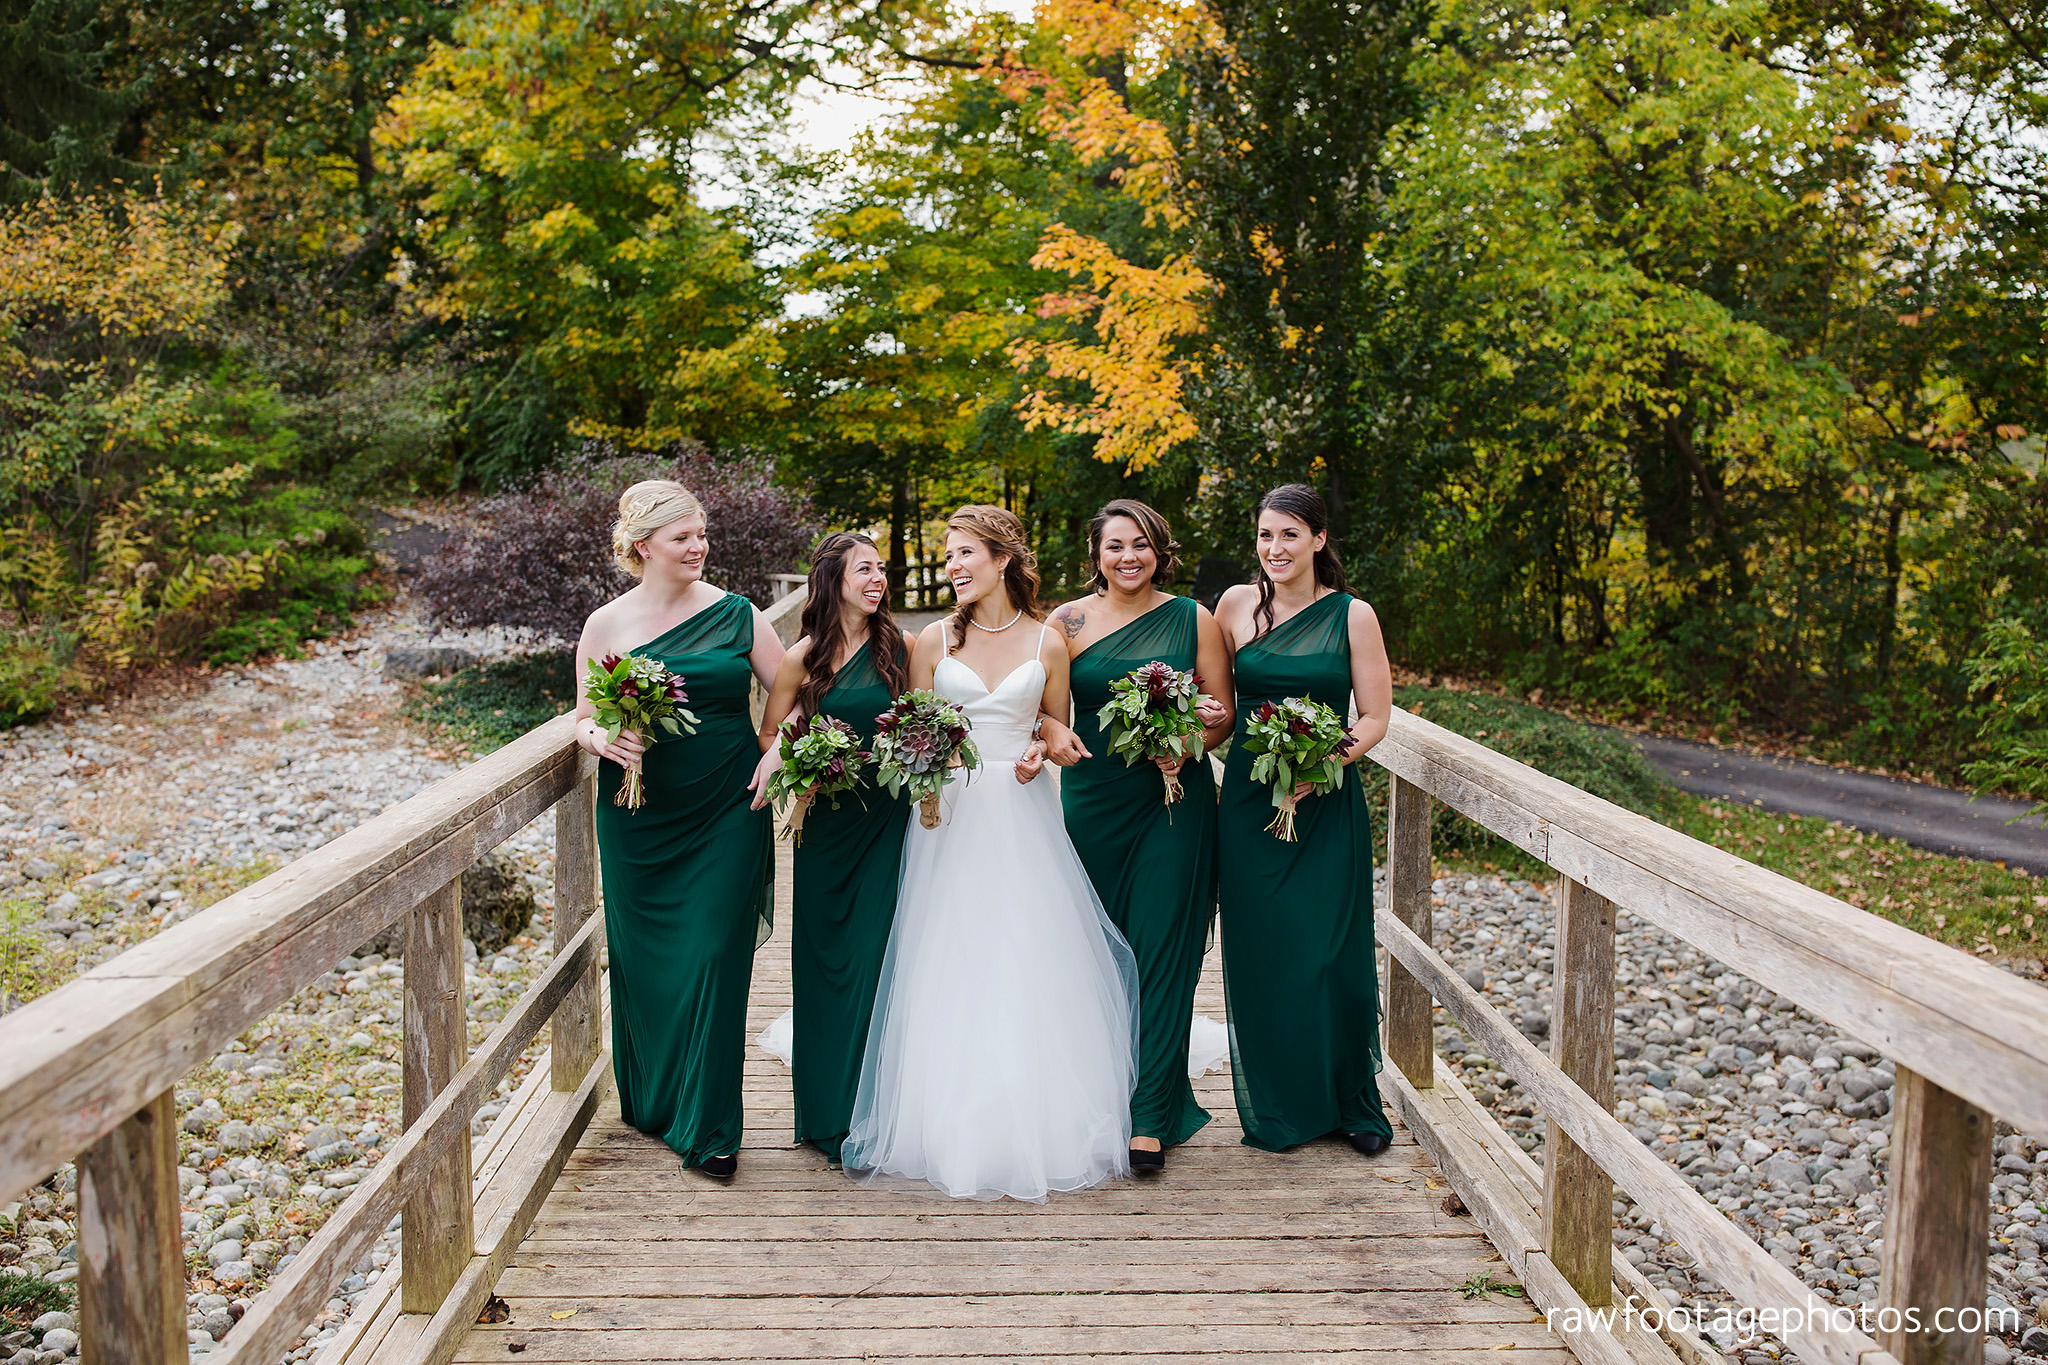 london_ontario_wedding_photographer-civic_gardens-springbank_park-succulent_bouquet-fall_wedding-bridge-raw_footage_photography049.jpg